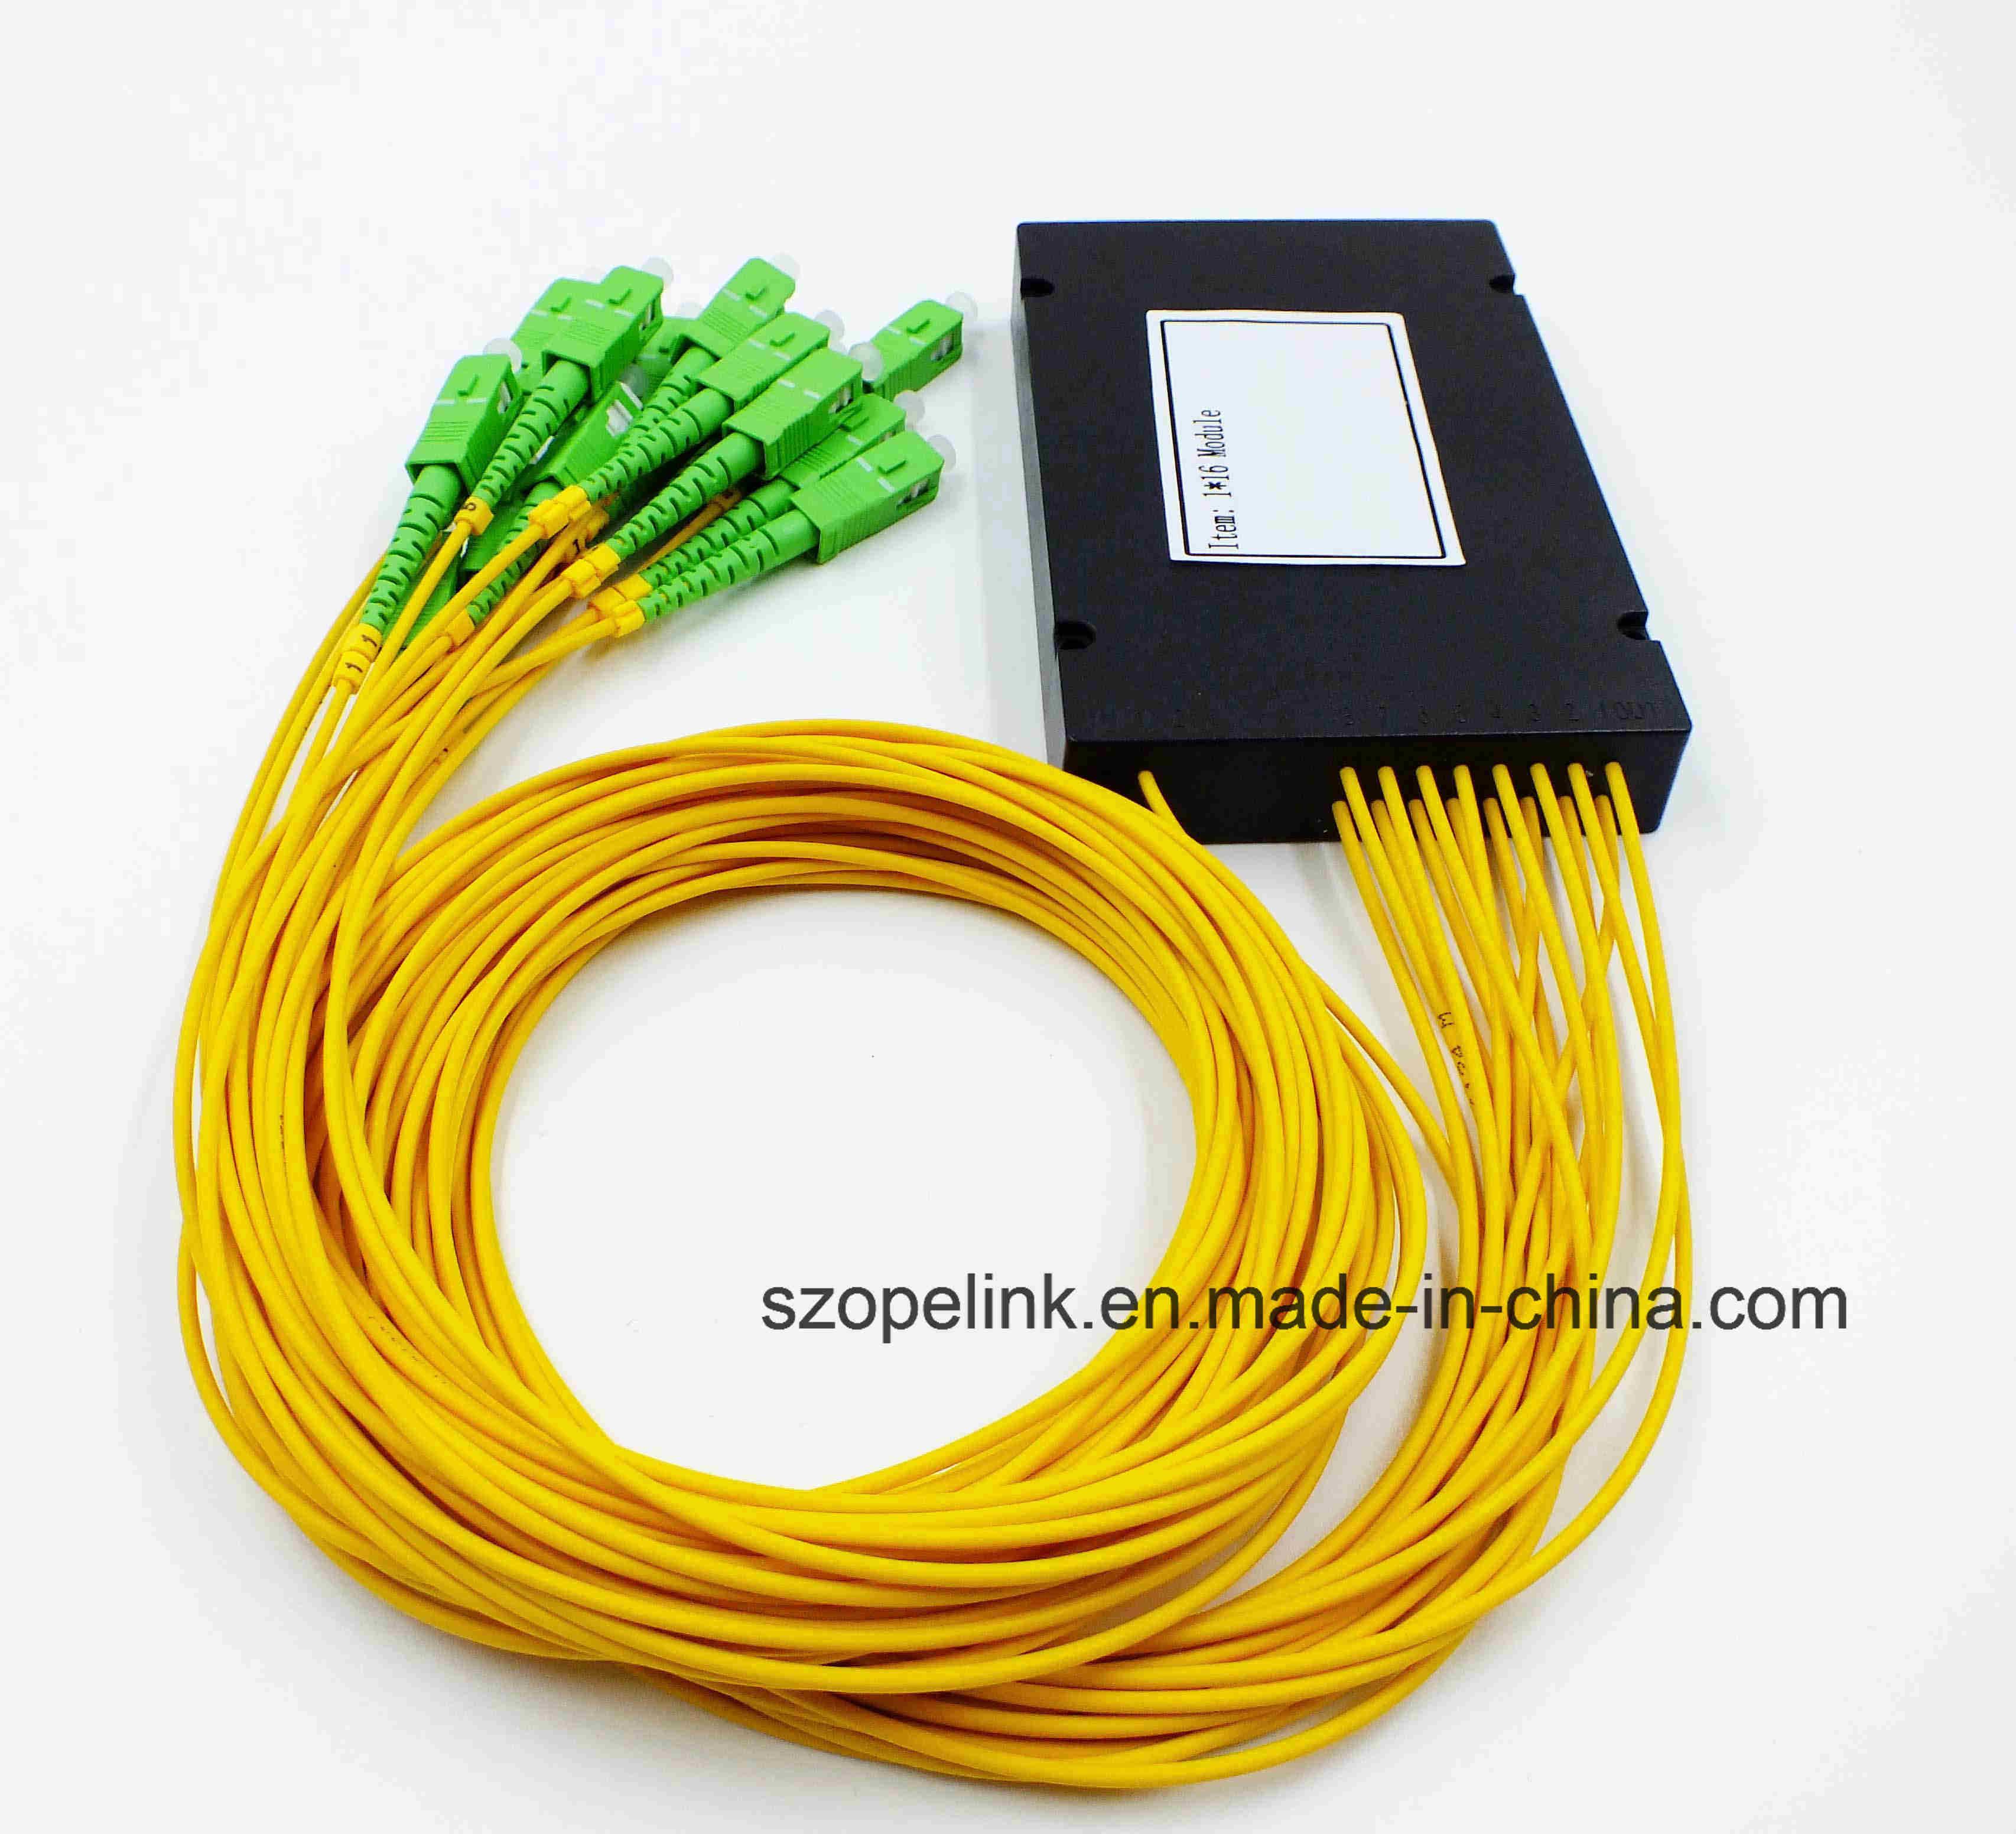 Gpon Epon Telecommunication Low Insertion Loss 1X2/4/8 PLC Splitter Plastic Box